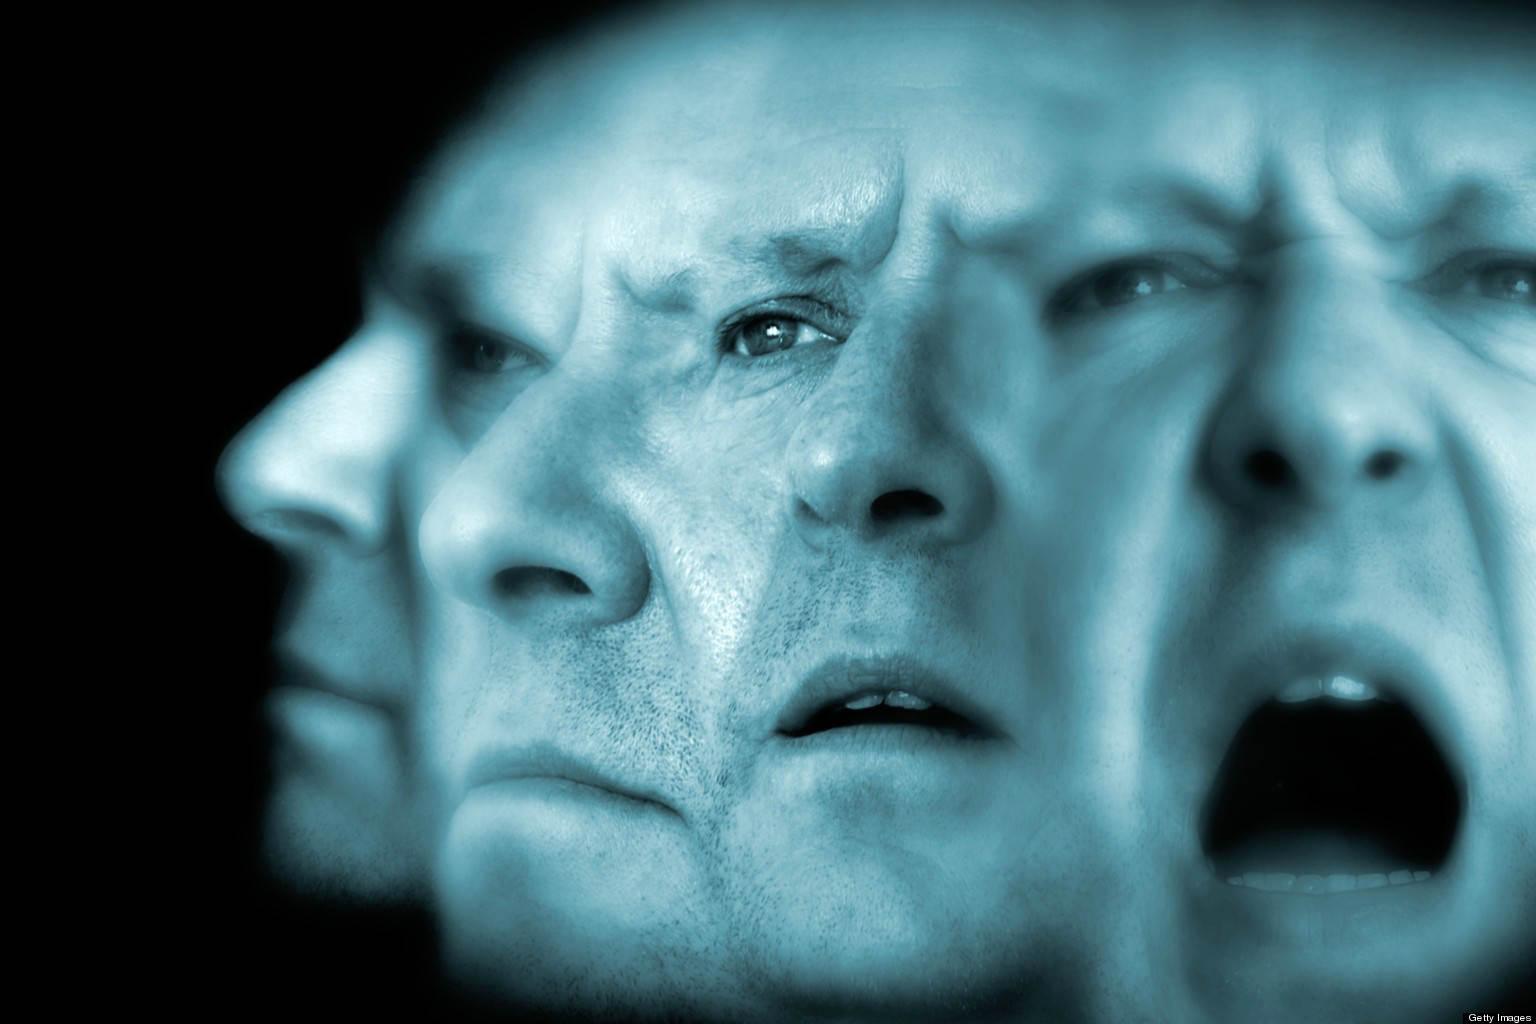 man develops schizophrenia due to permanent stress